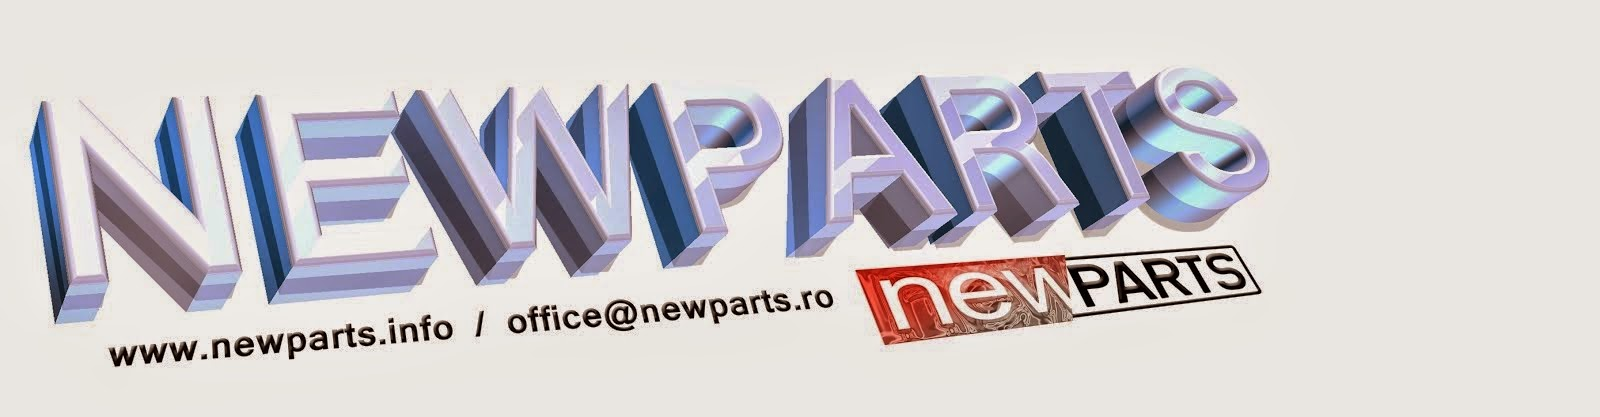 http://www.newparts.info/